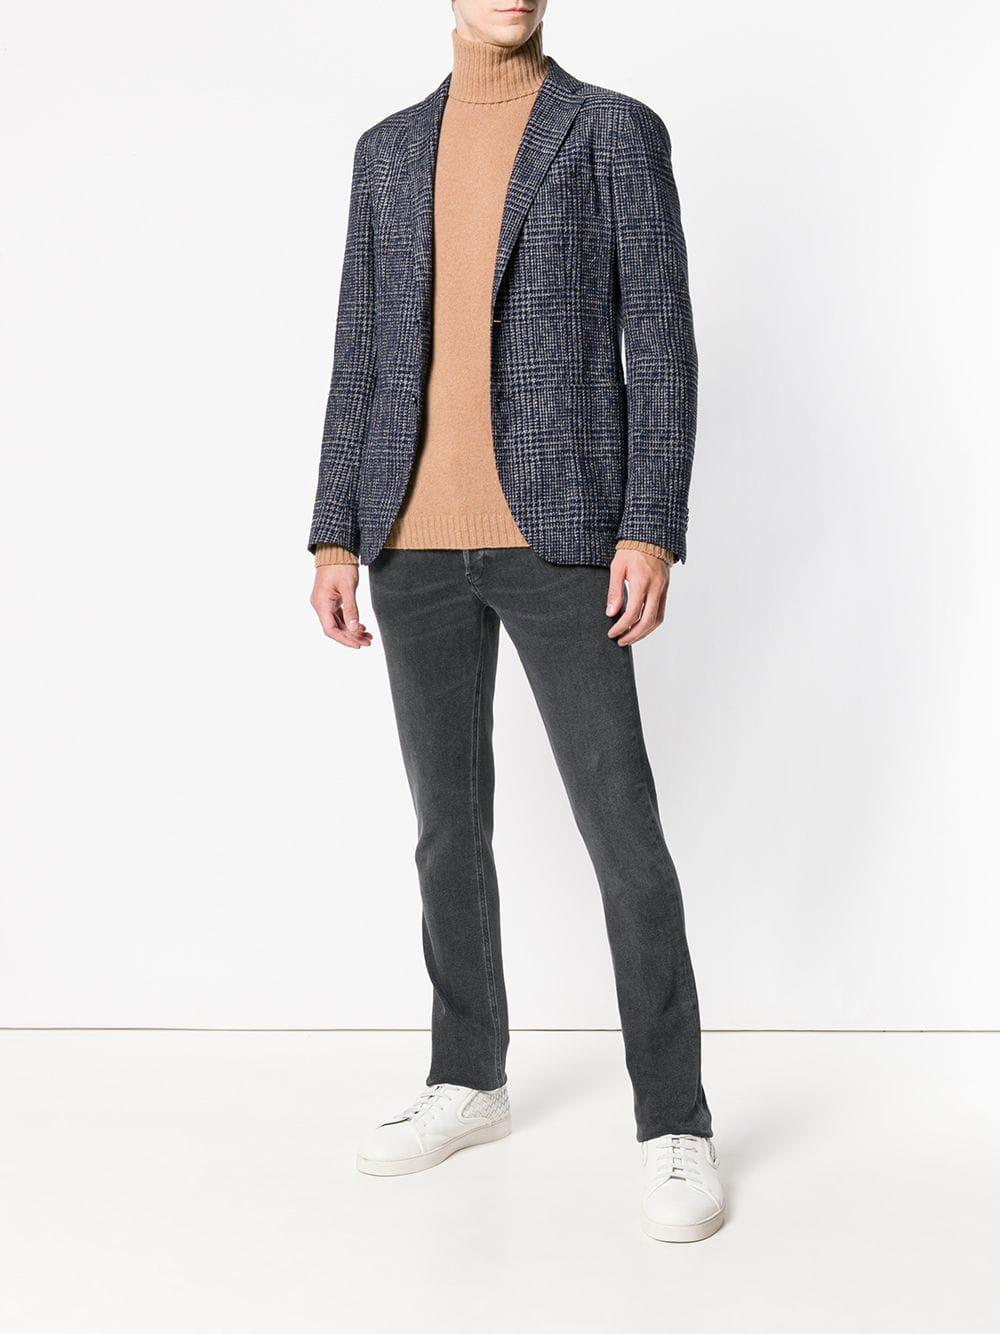 Dondup Cotton George Skinny Jeans in Black for Men